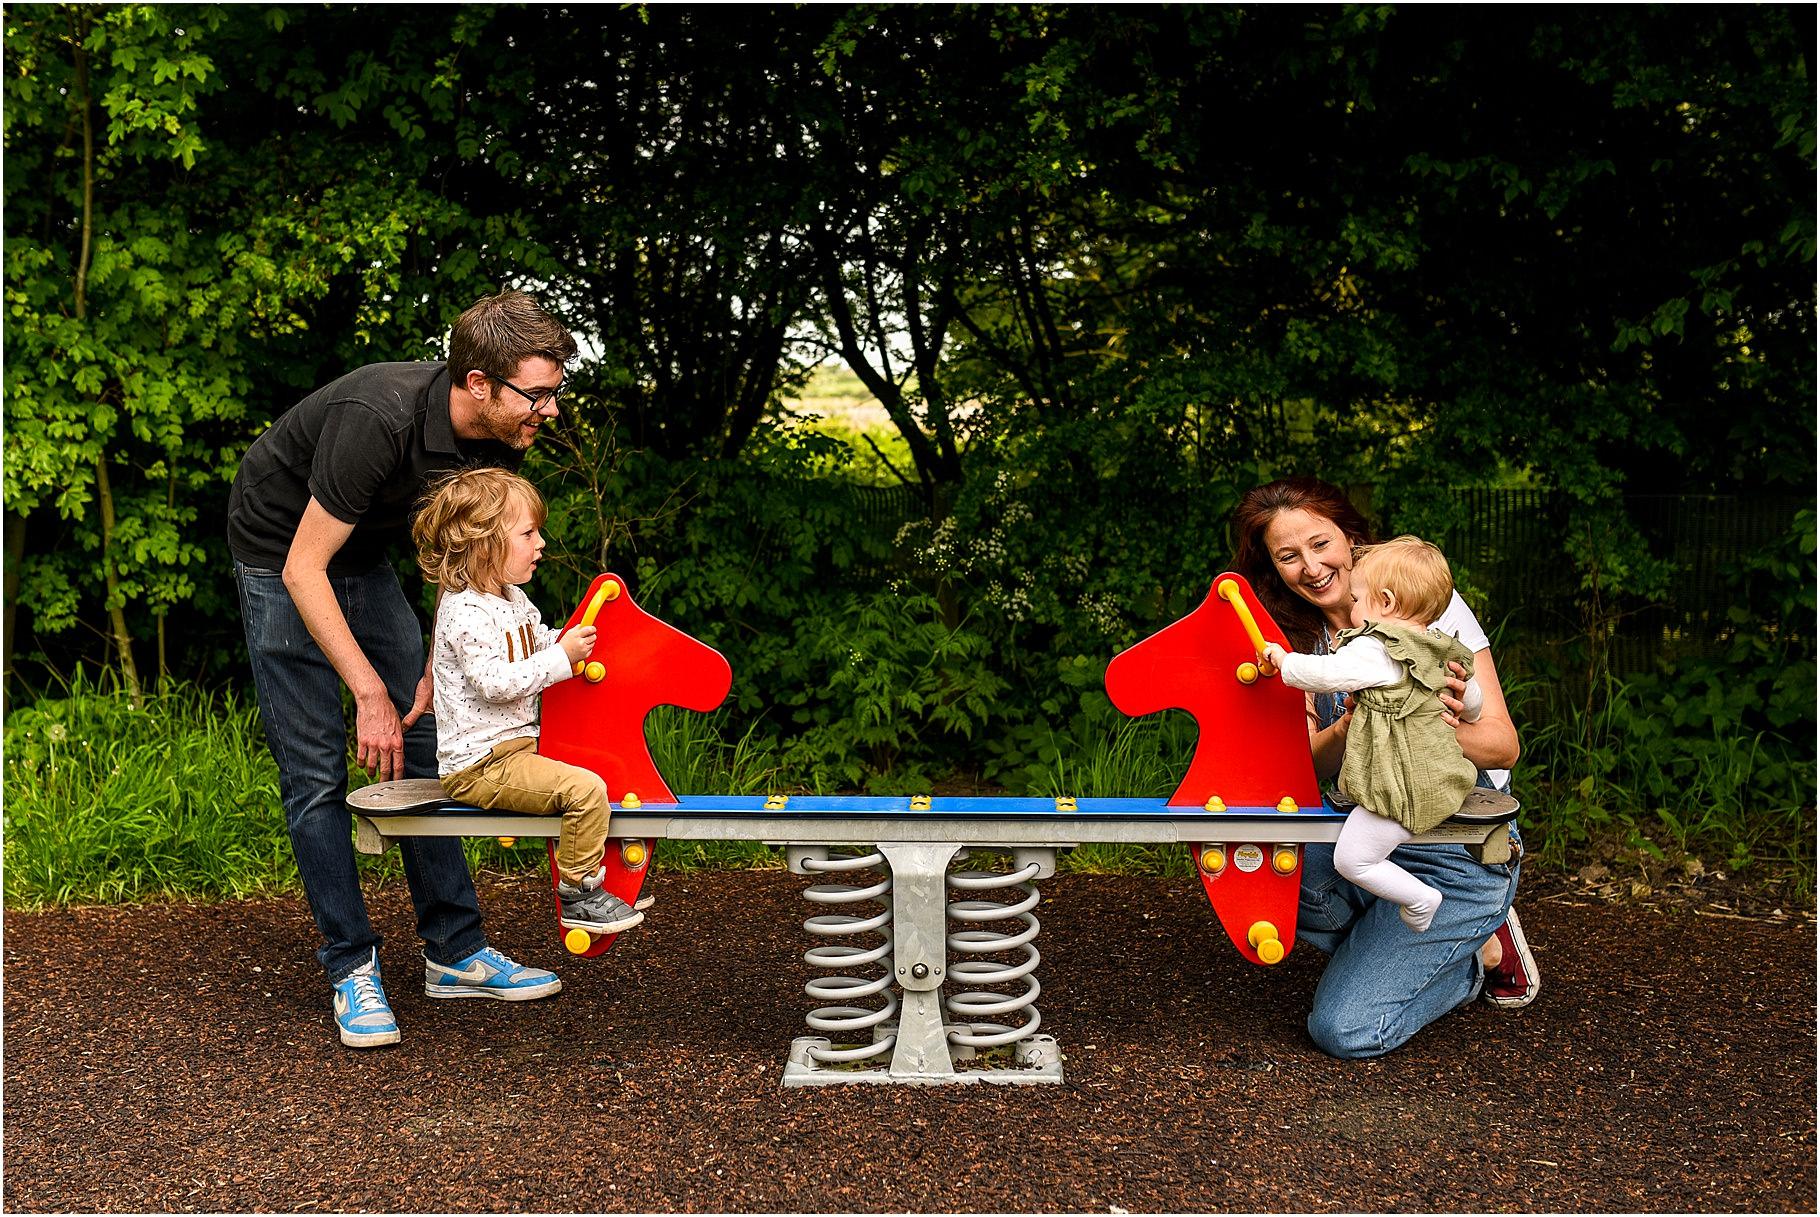 lancashire-family-photographer-05.jpg